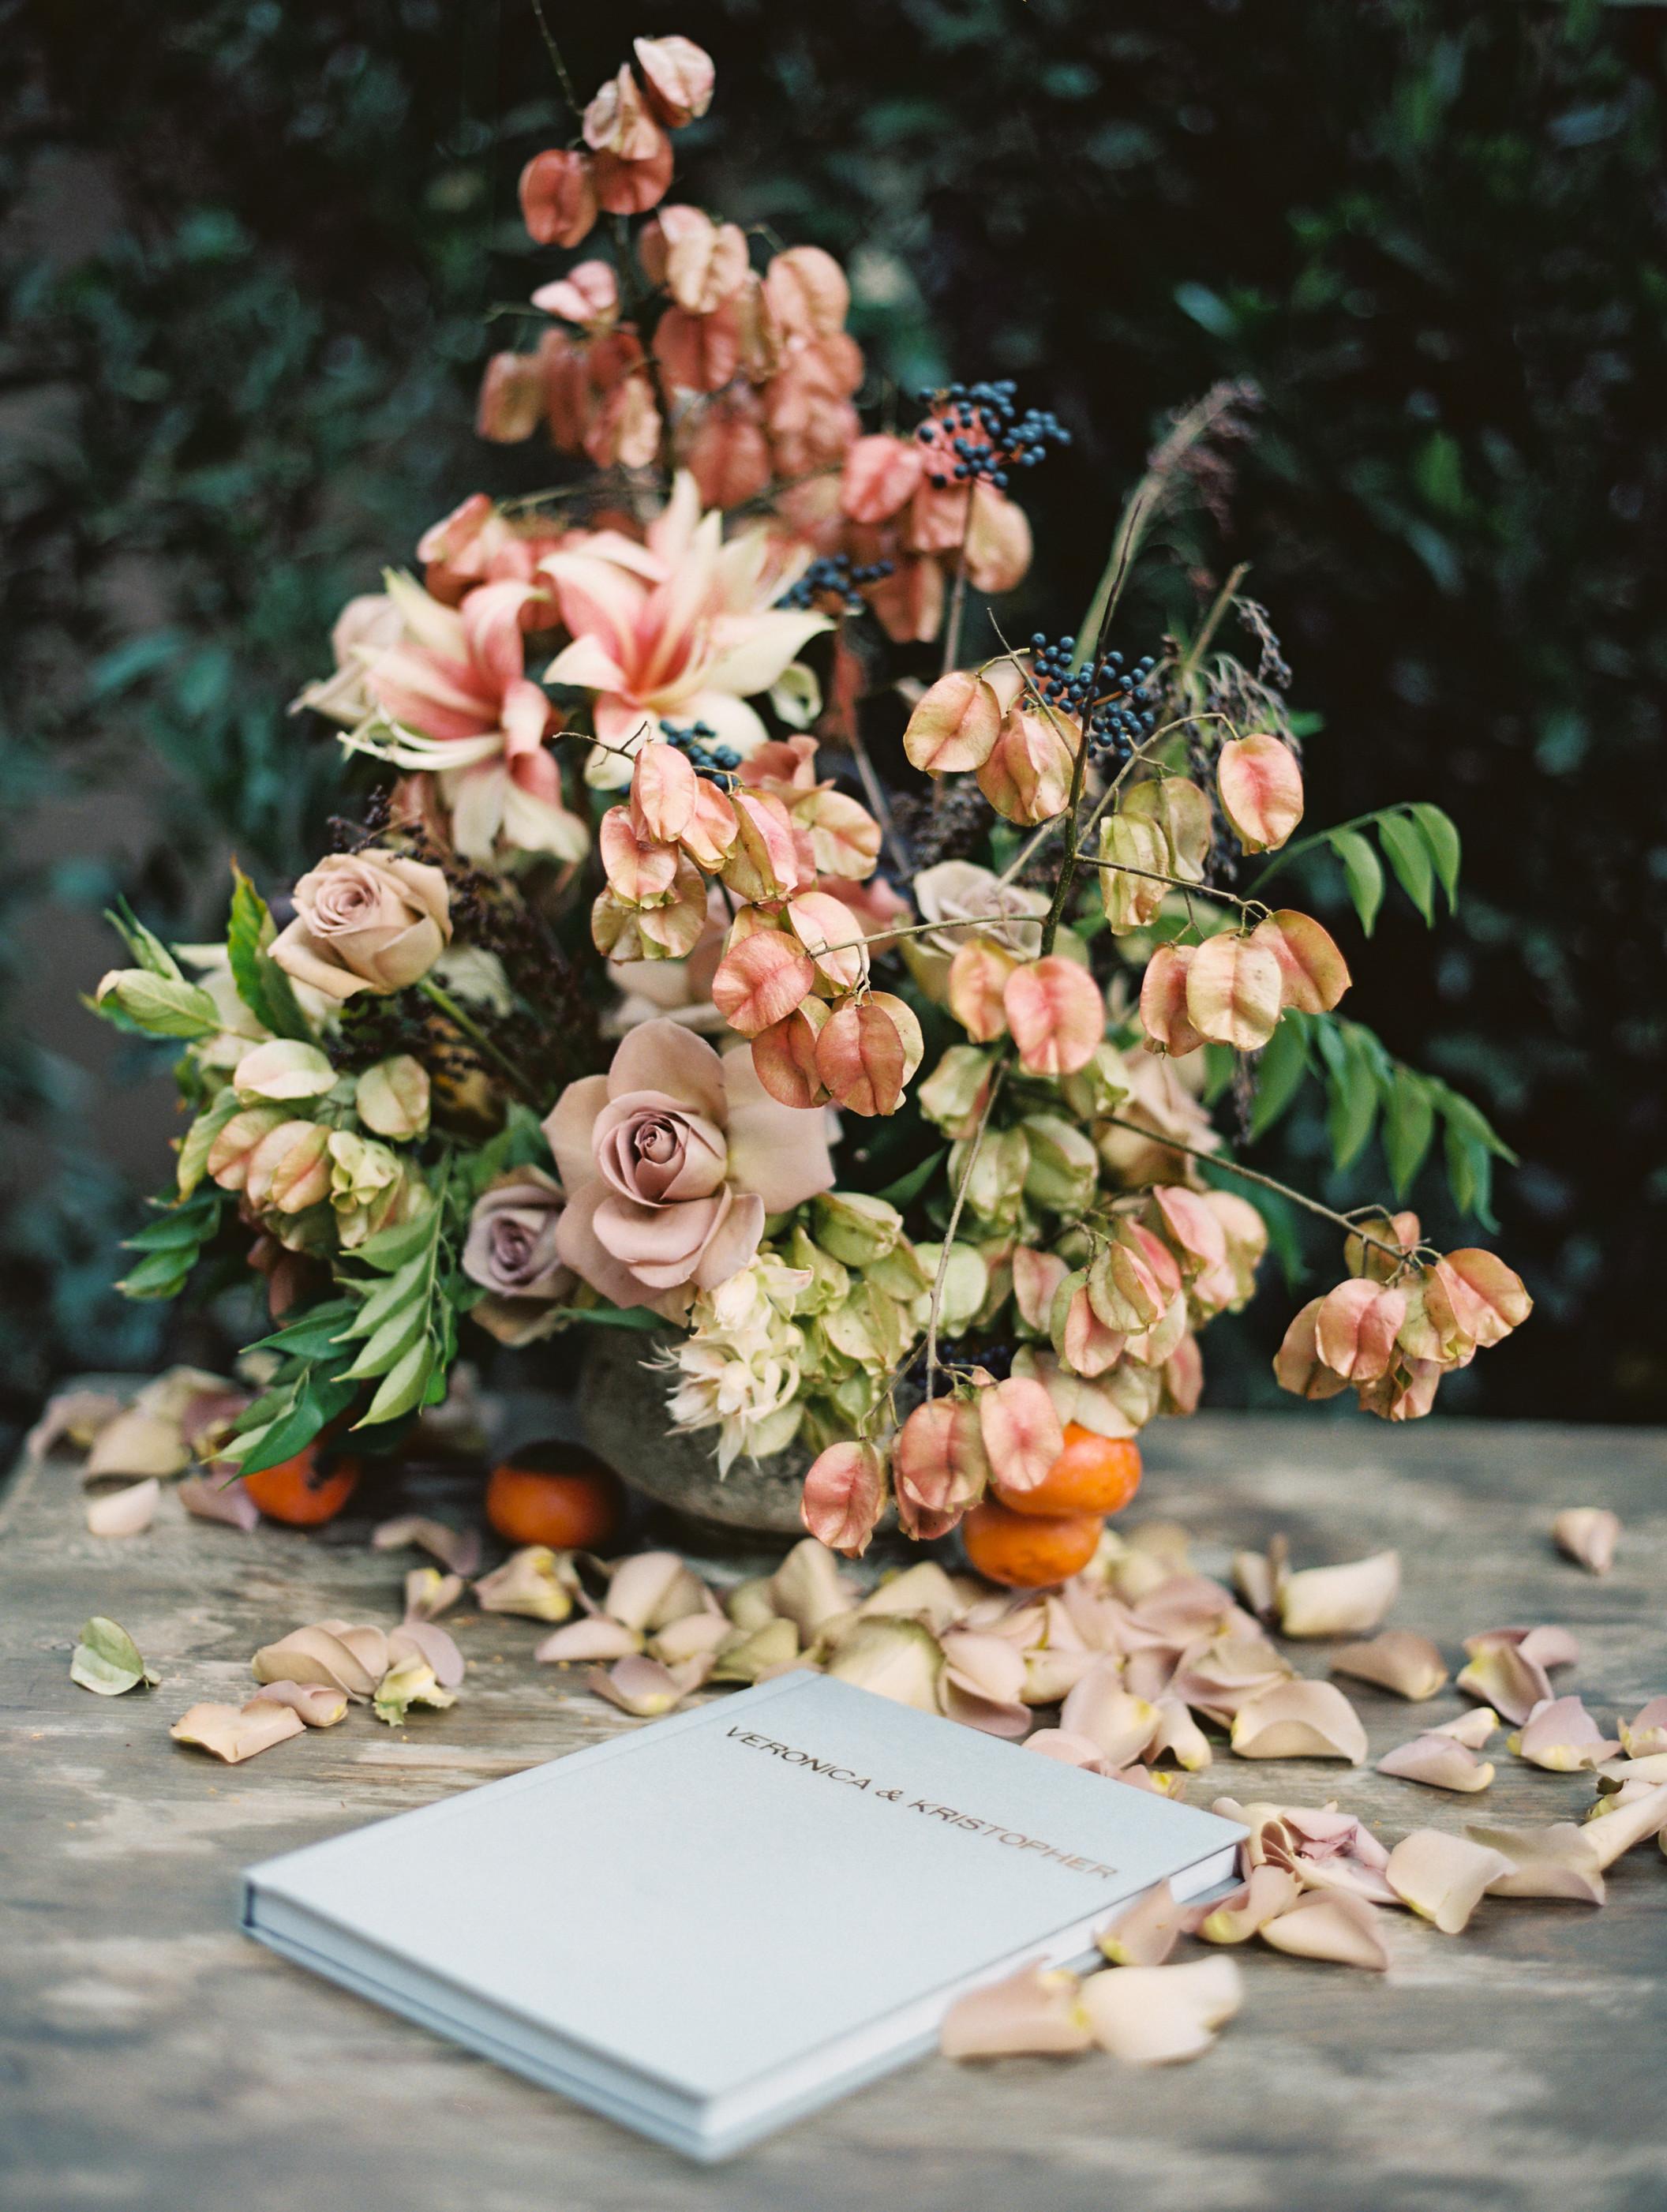 572-fine-art-film-kristopher-veronica-malibu-wedding-brumley-wells-2112x2802.jpg